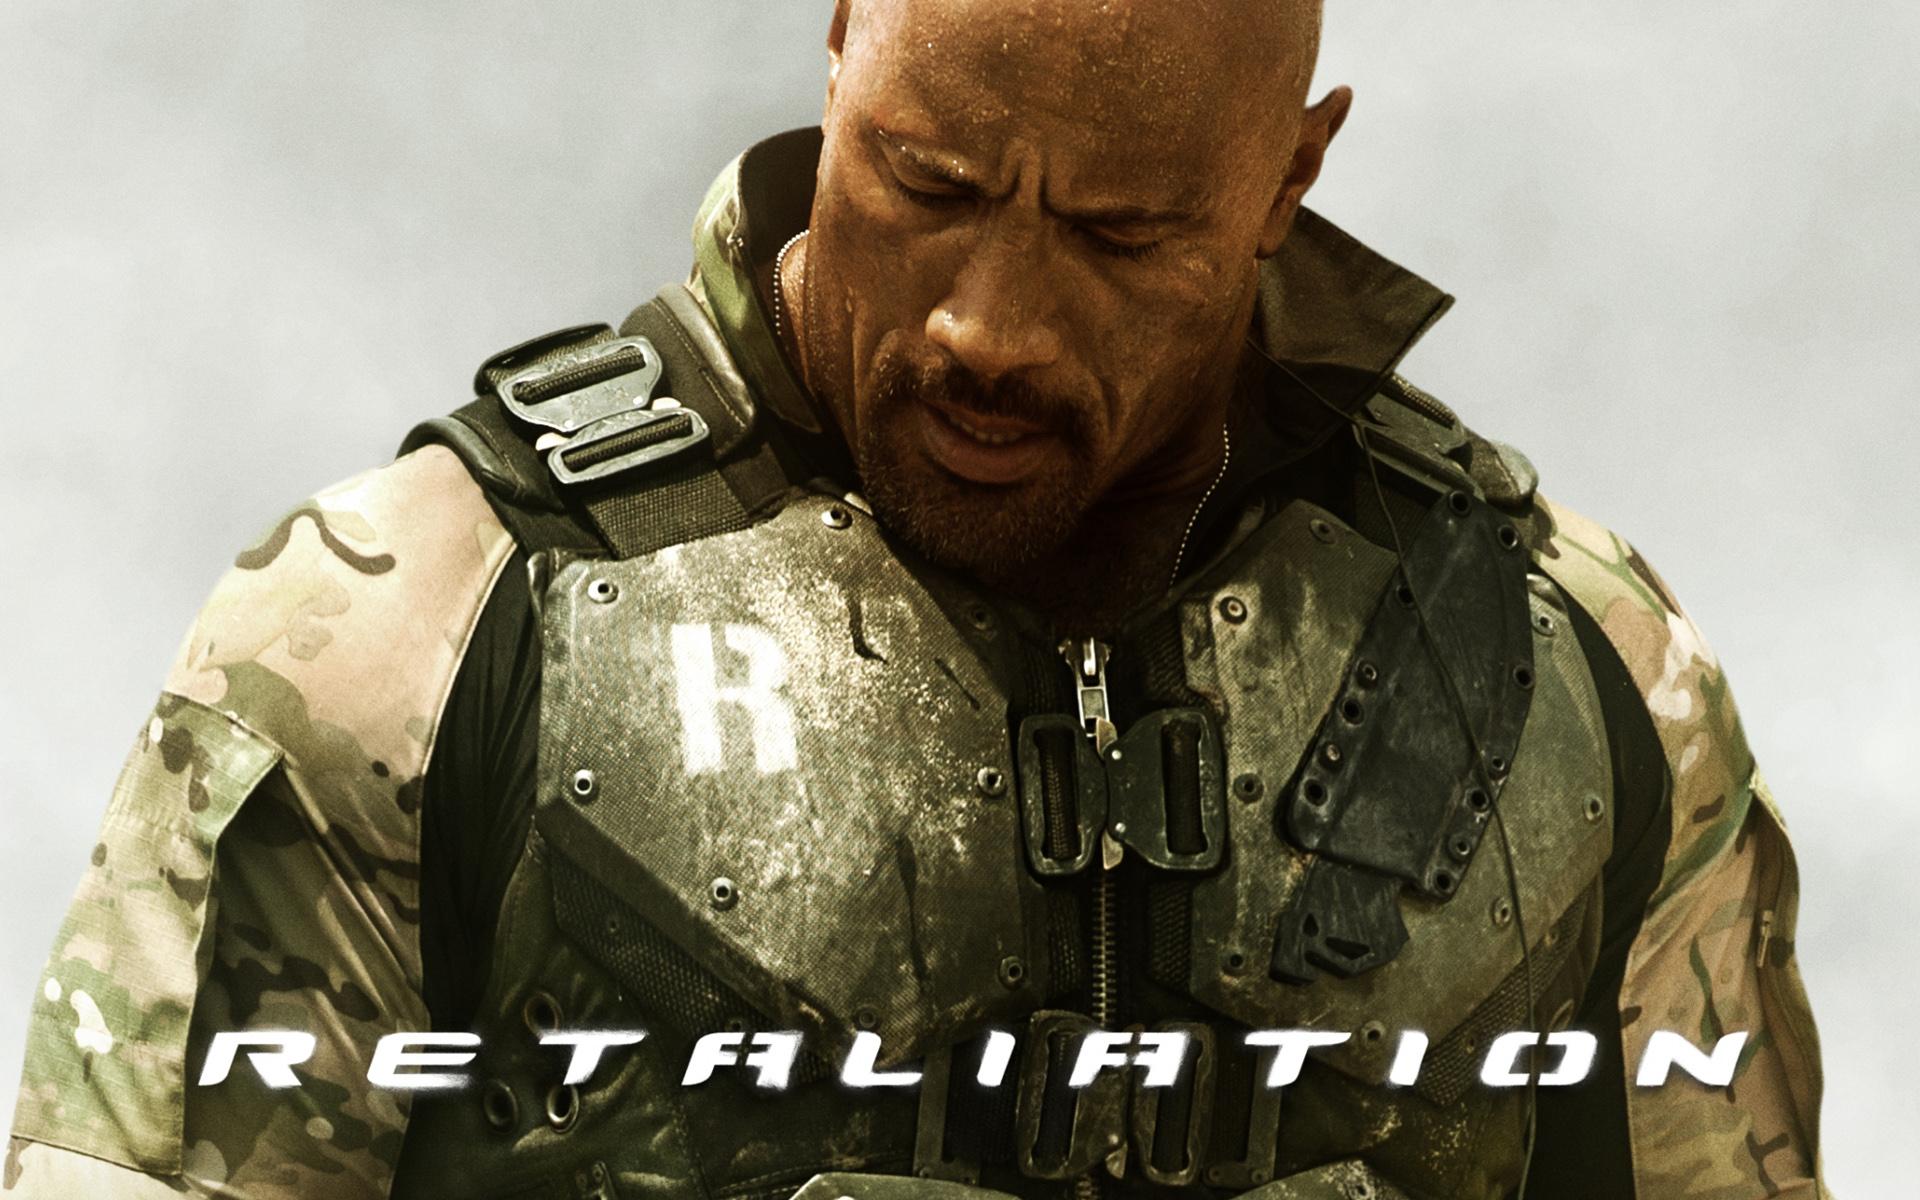 The Rock in GI Joe 2 Retaliation wallpaper